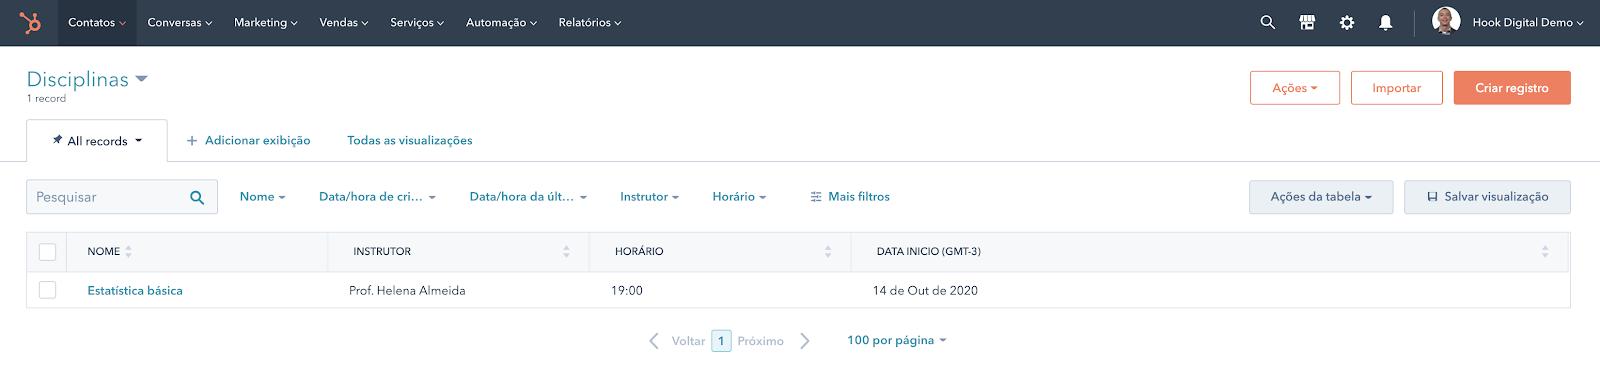 Hubspot Objeto customizado - Edição